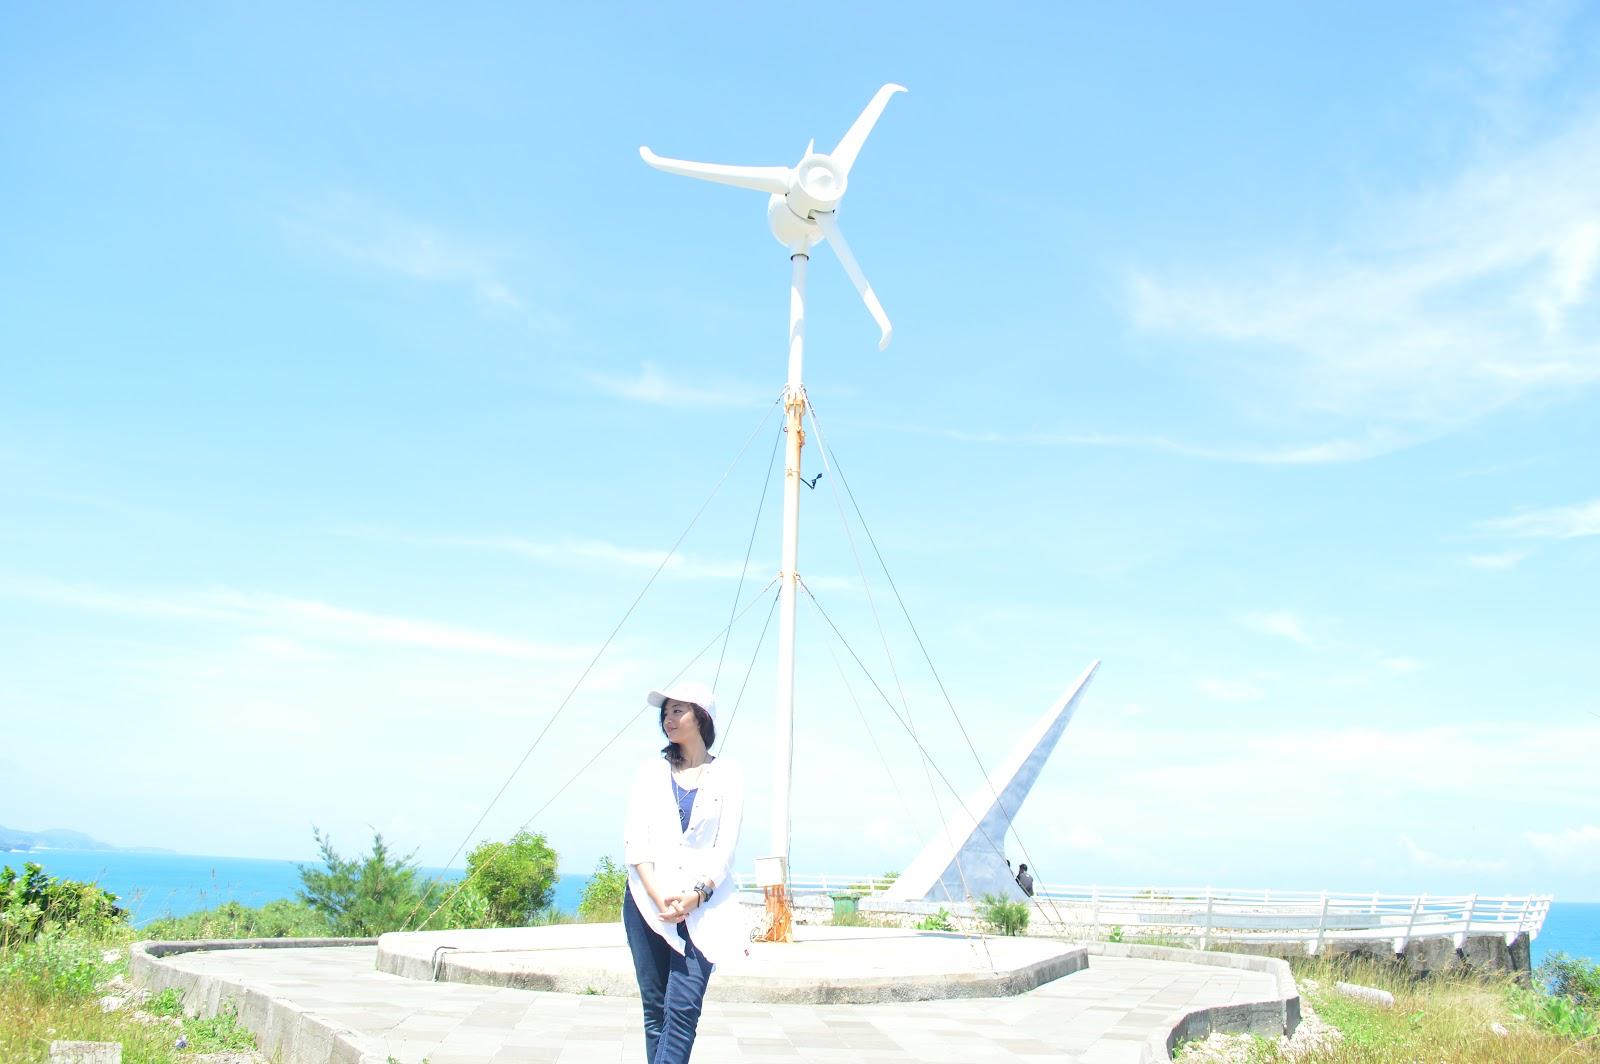 Spot Foto Bagus Jam Matahari Baron Techno Park Gunungkidul Ya